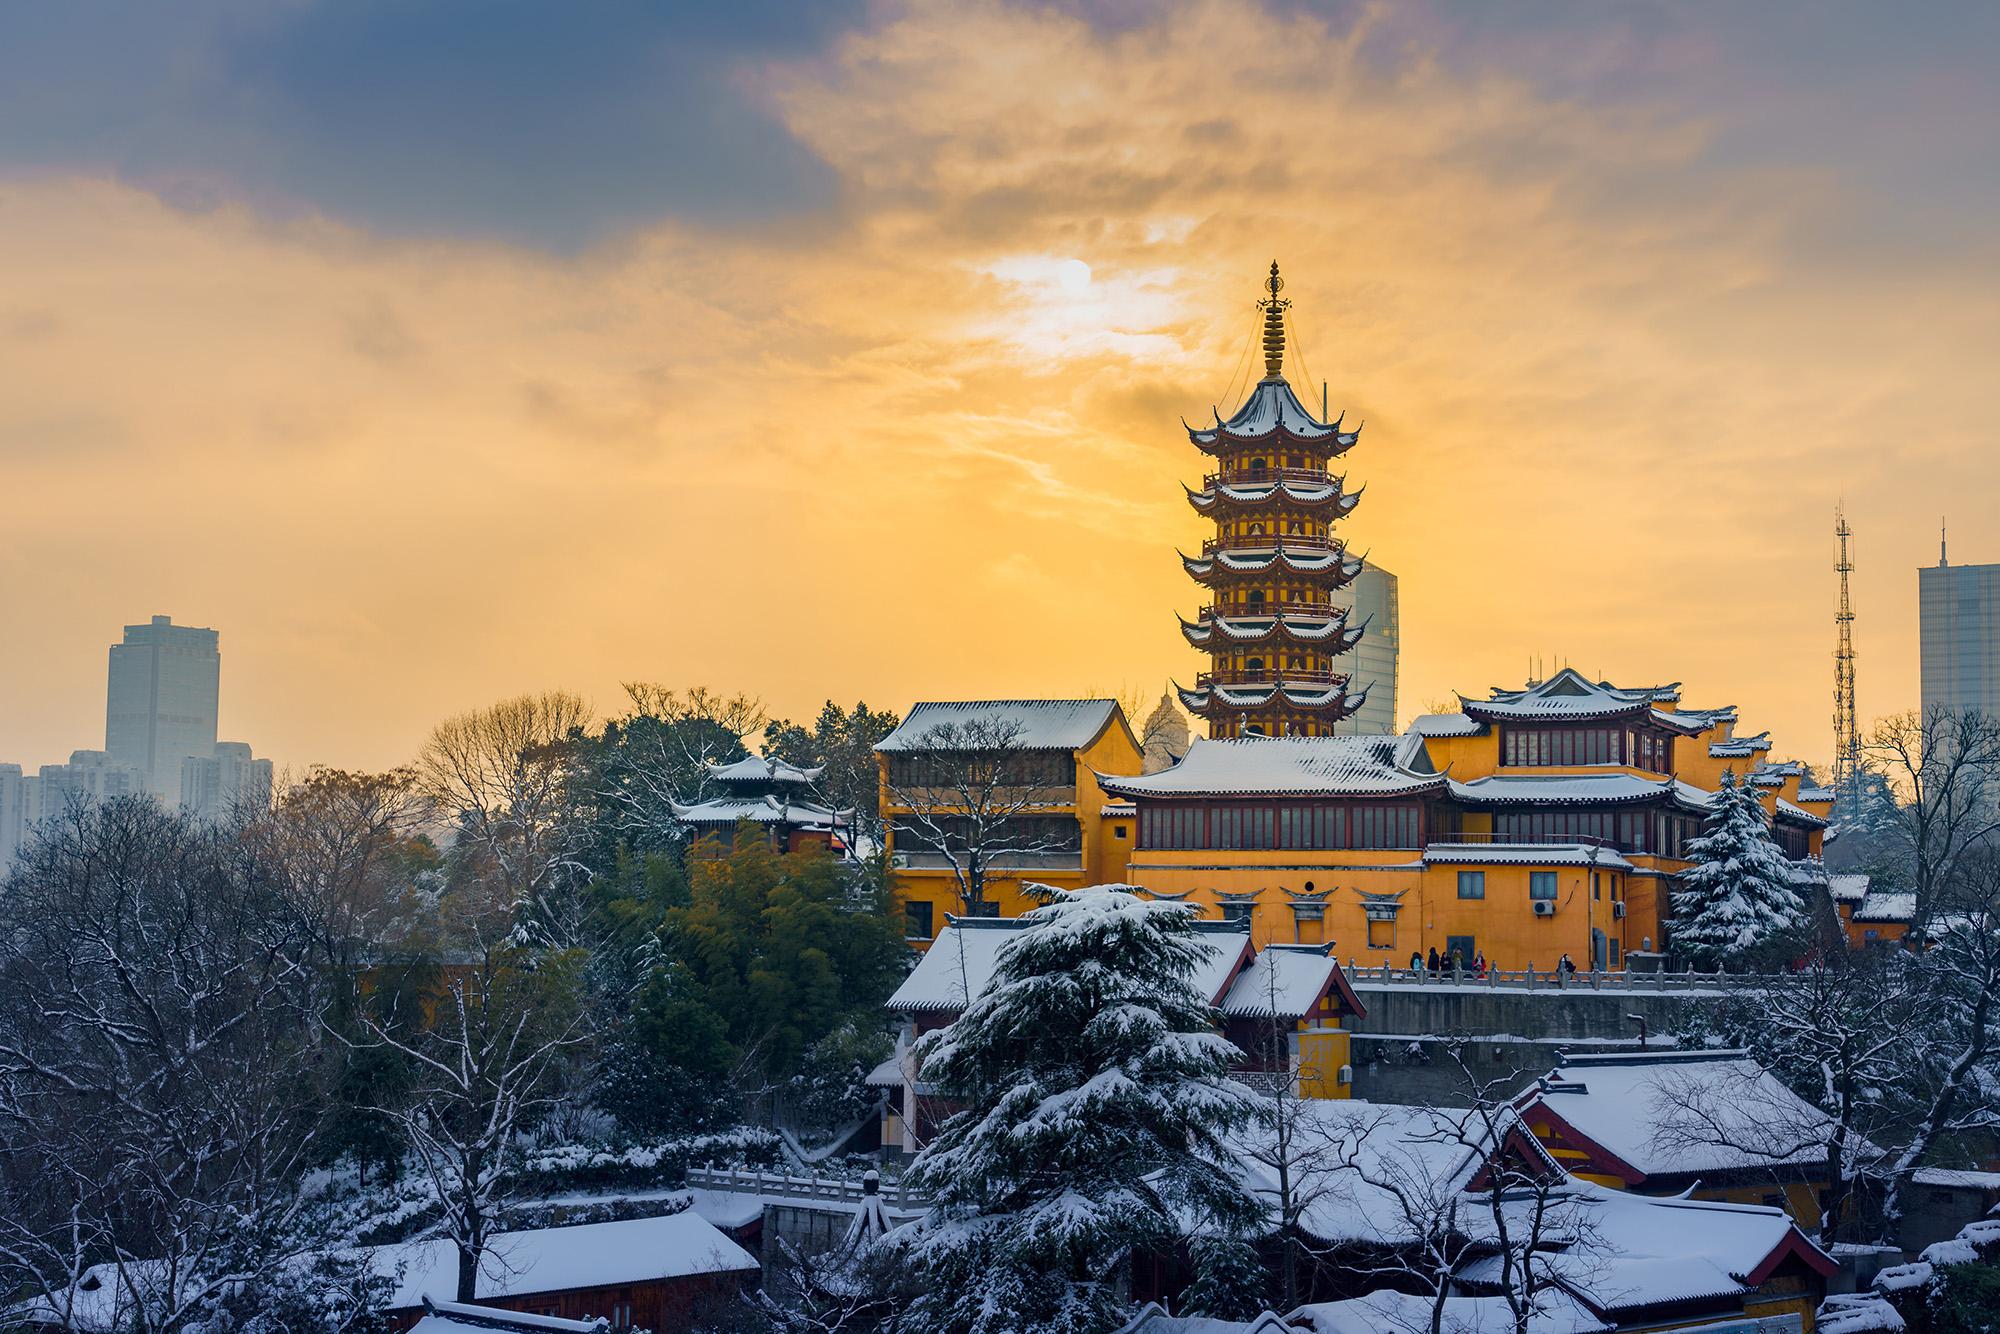 Nanjing Jiming Temple (Kenneth Yang)